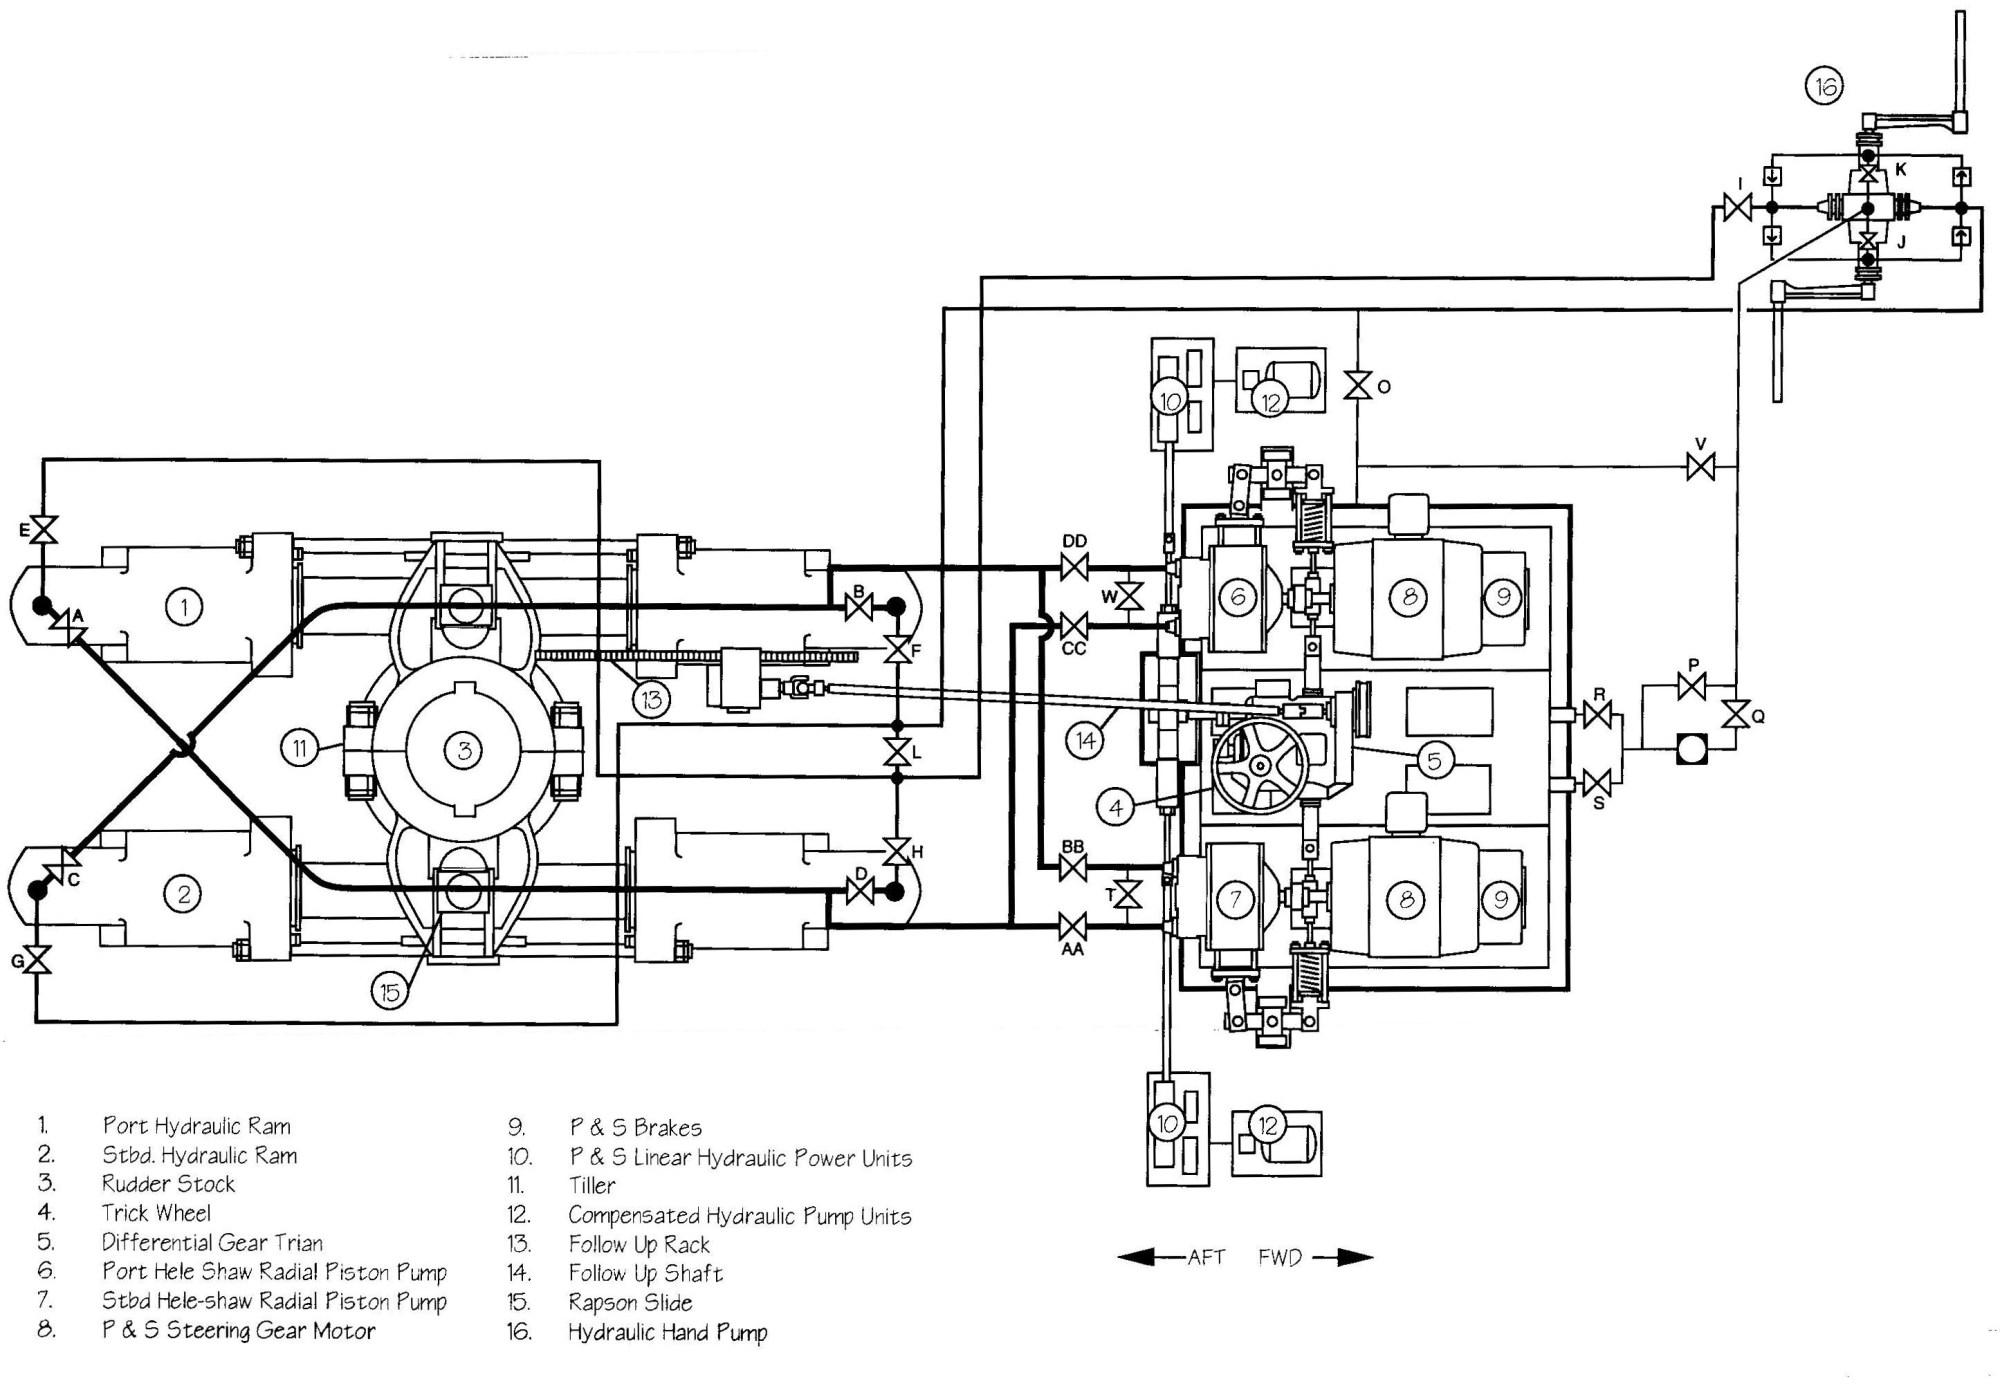 hight resolution of hydraulic pump diagram tsps engineering manual of hydraulic pump diagram monarch hydraulic pump wiring diagram wiring